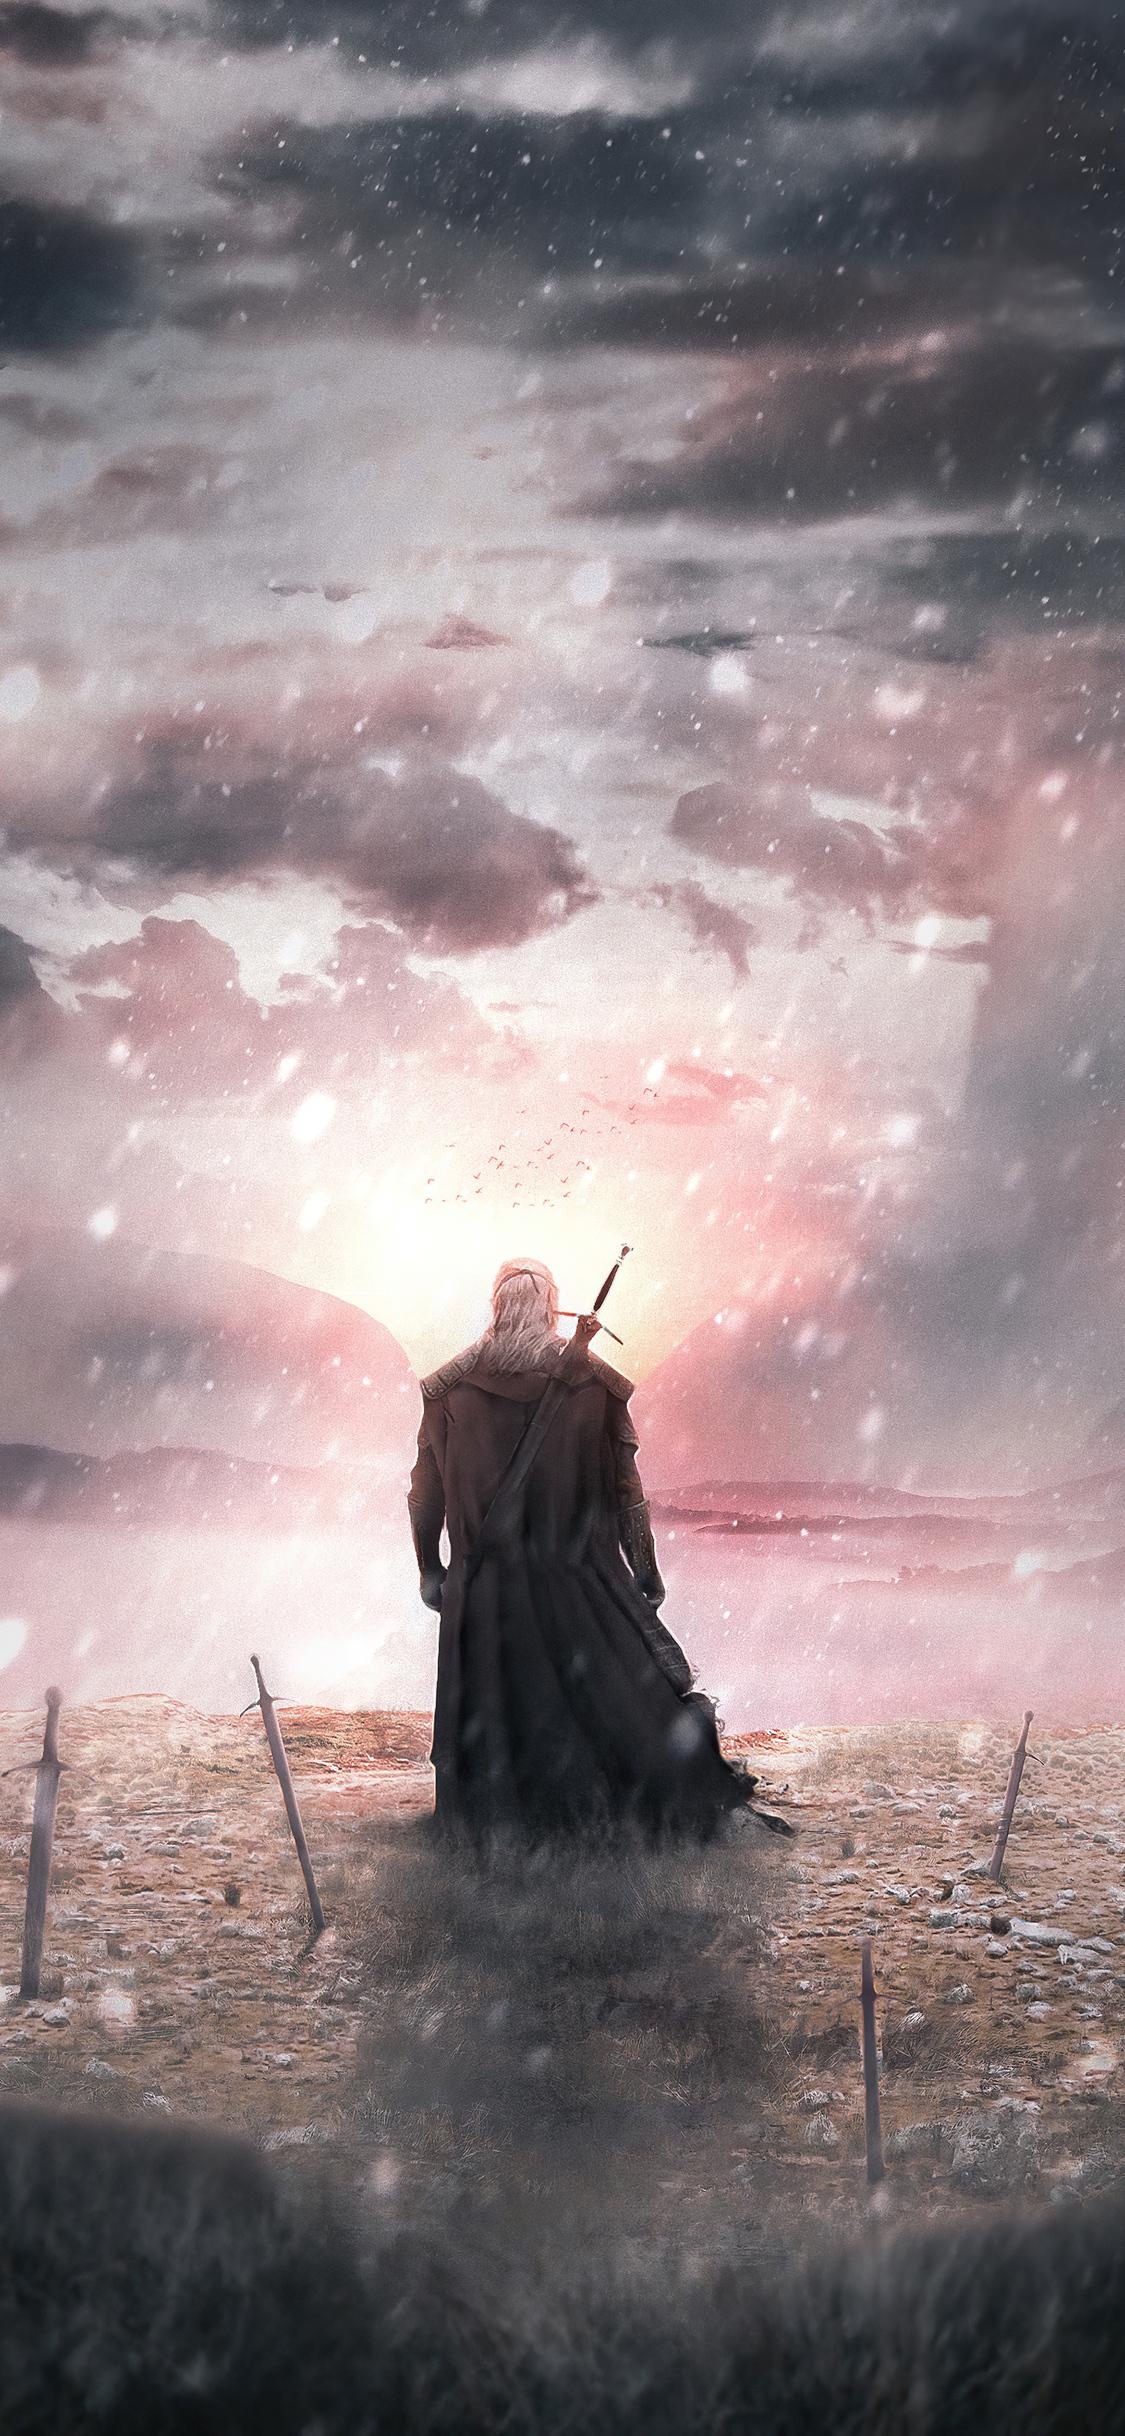 the-witcher-journey-4k-4r.jpg